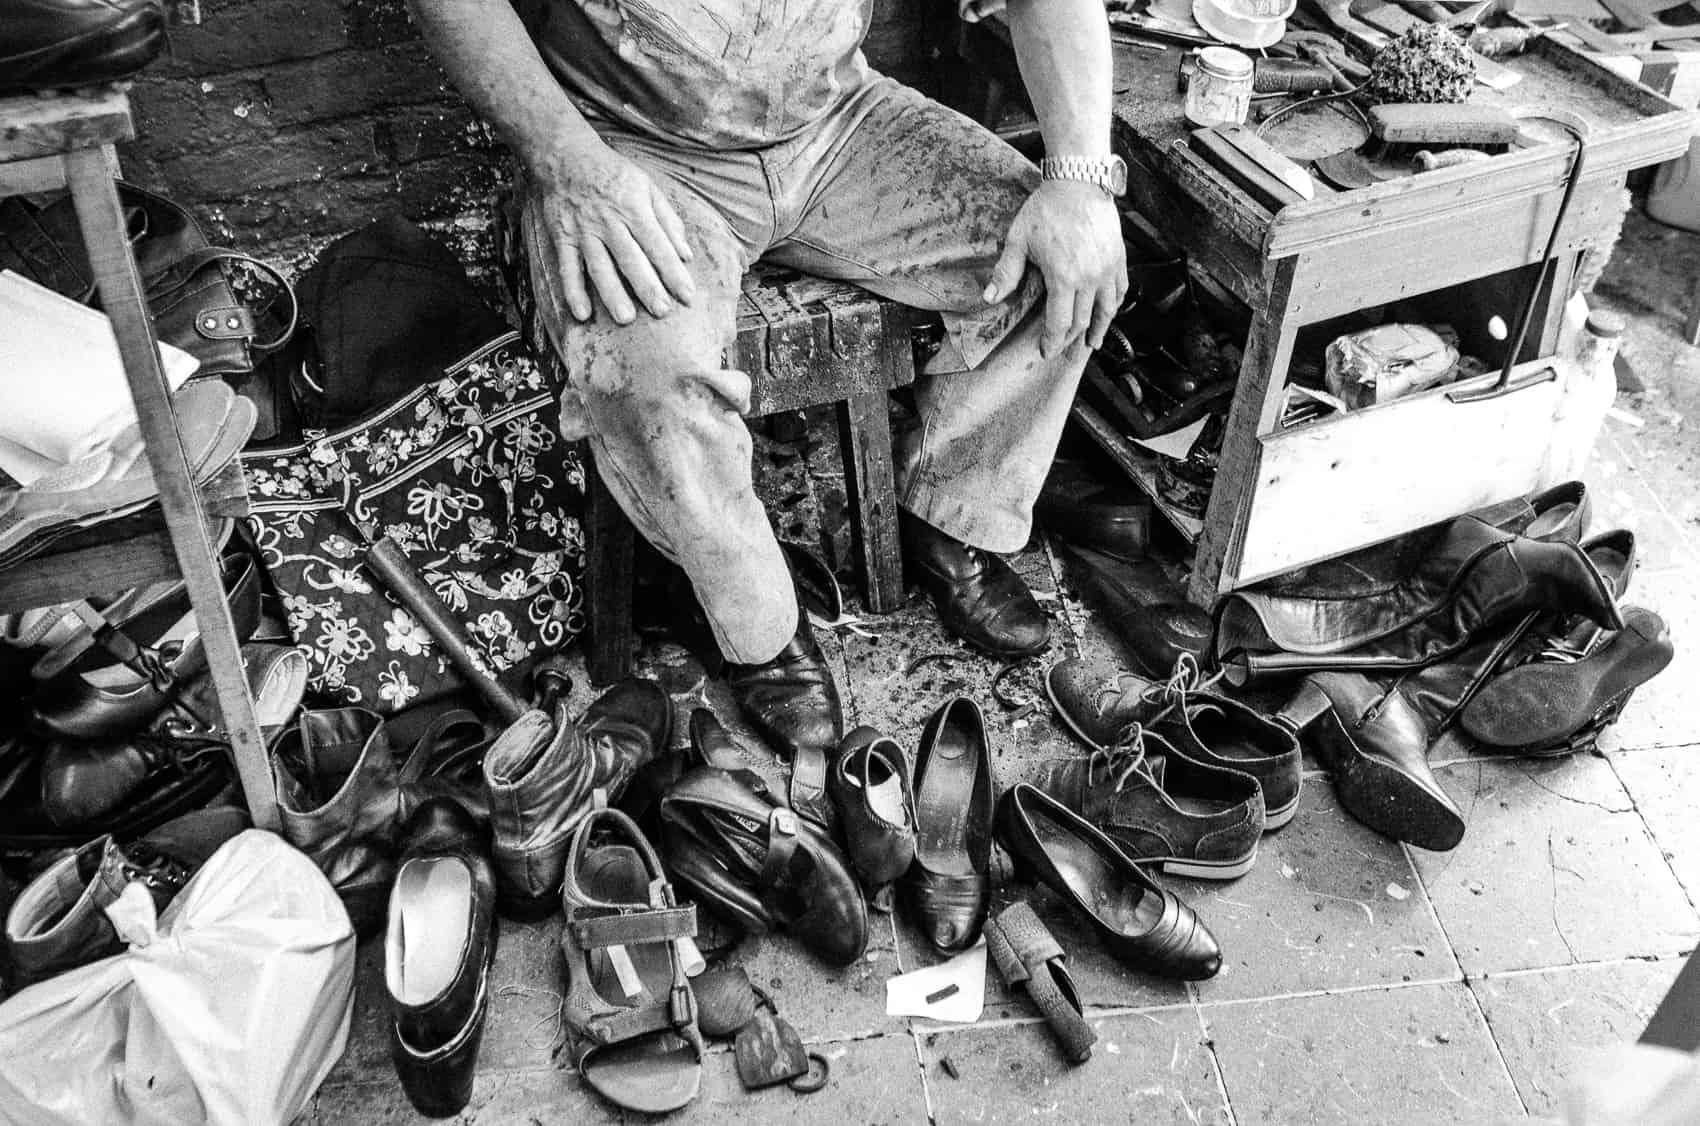 cfe540e9b9c92 PHOTO ESSAY: Barrio Amón Shoe Repair Shop – The Tico Times   Costa ...